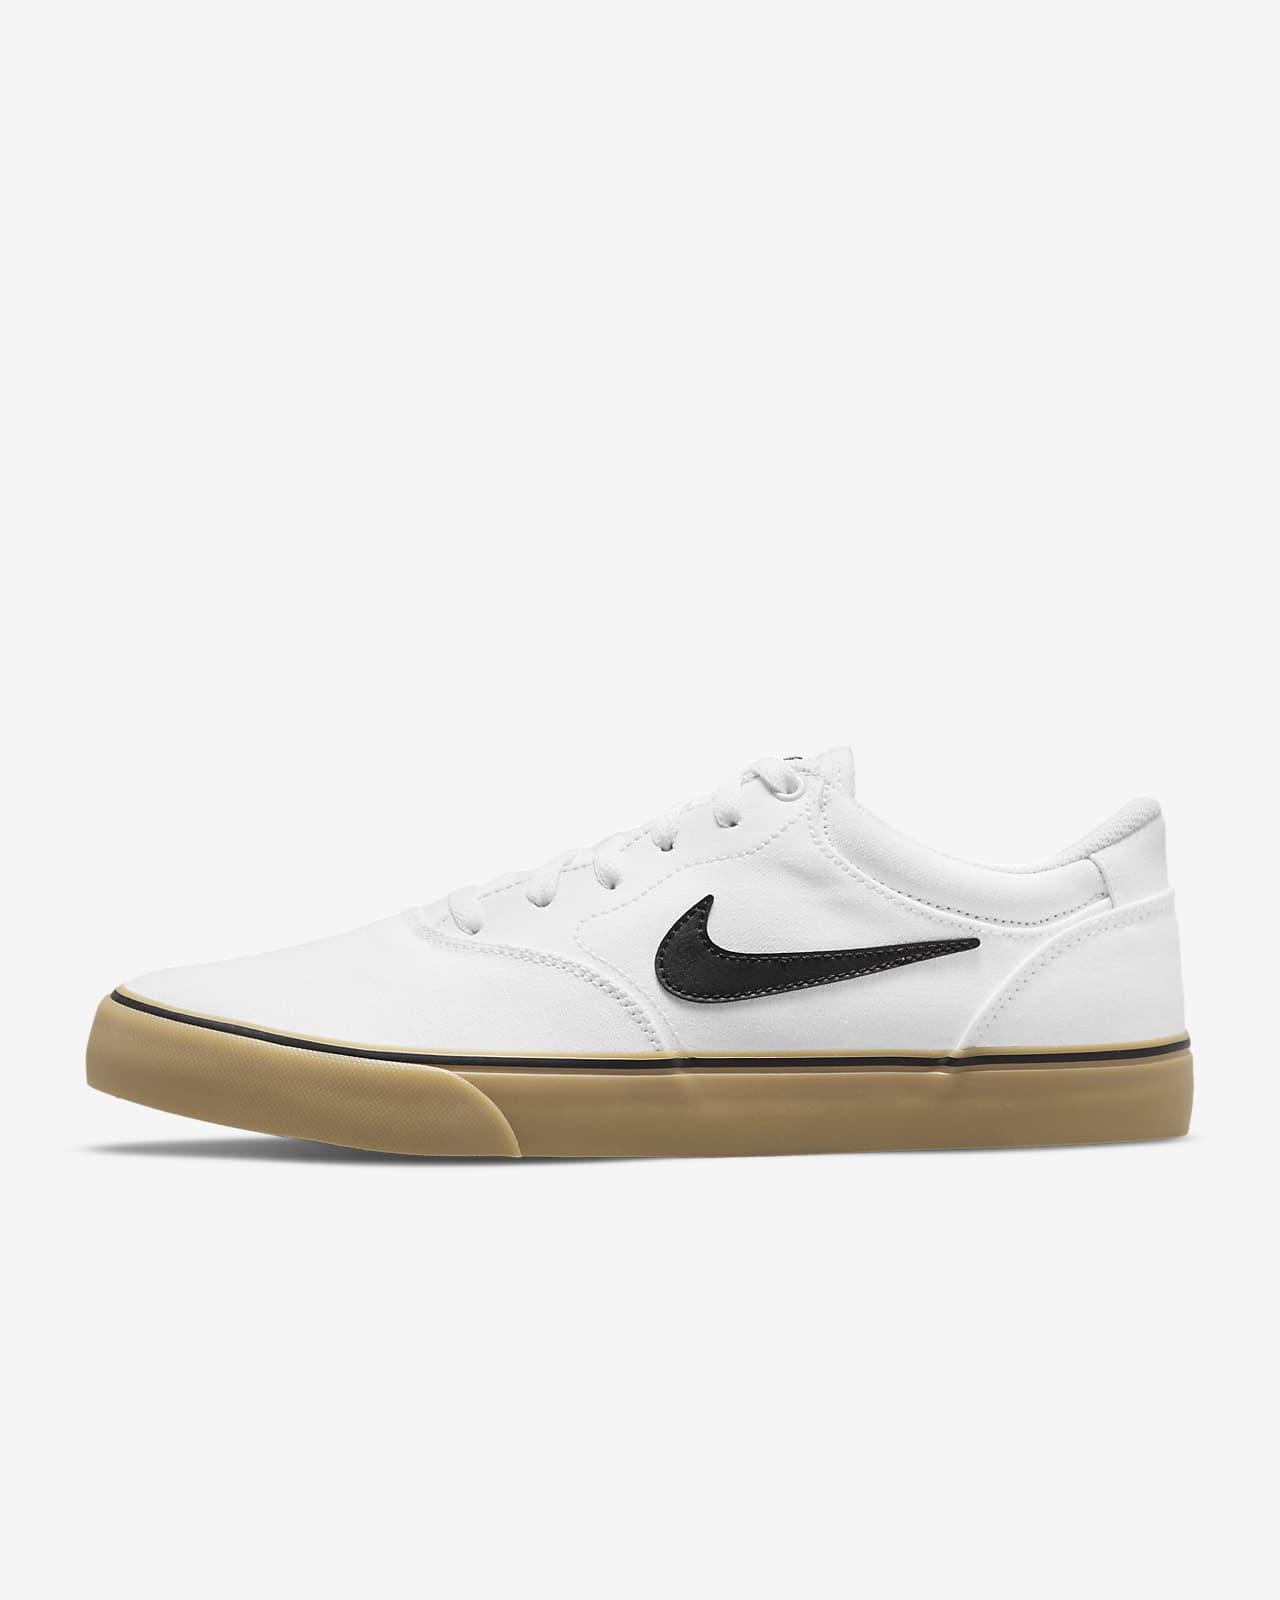 Nike SB Chron 2 Canvas Skate Shoes